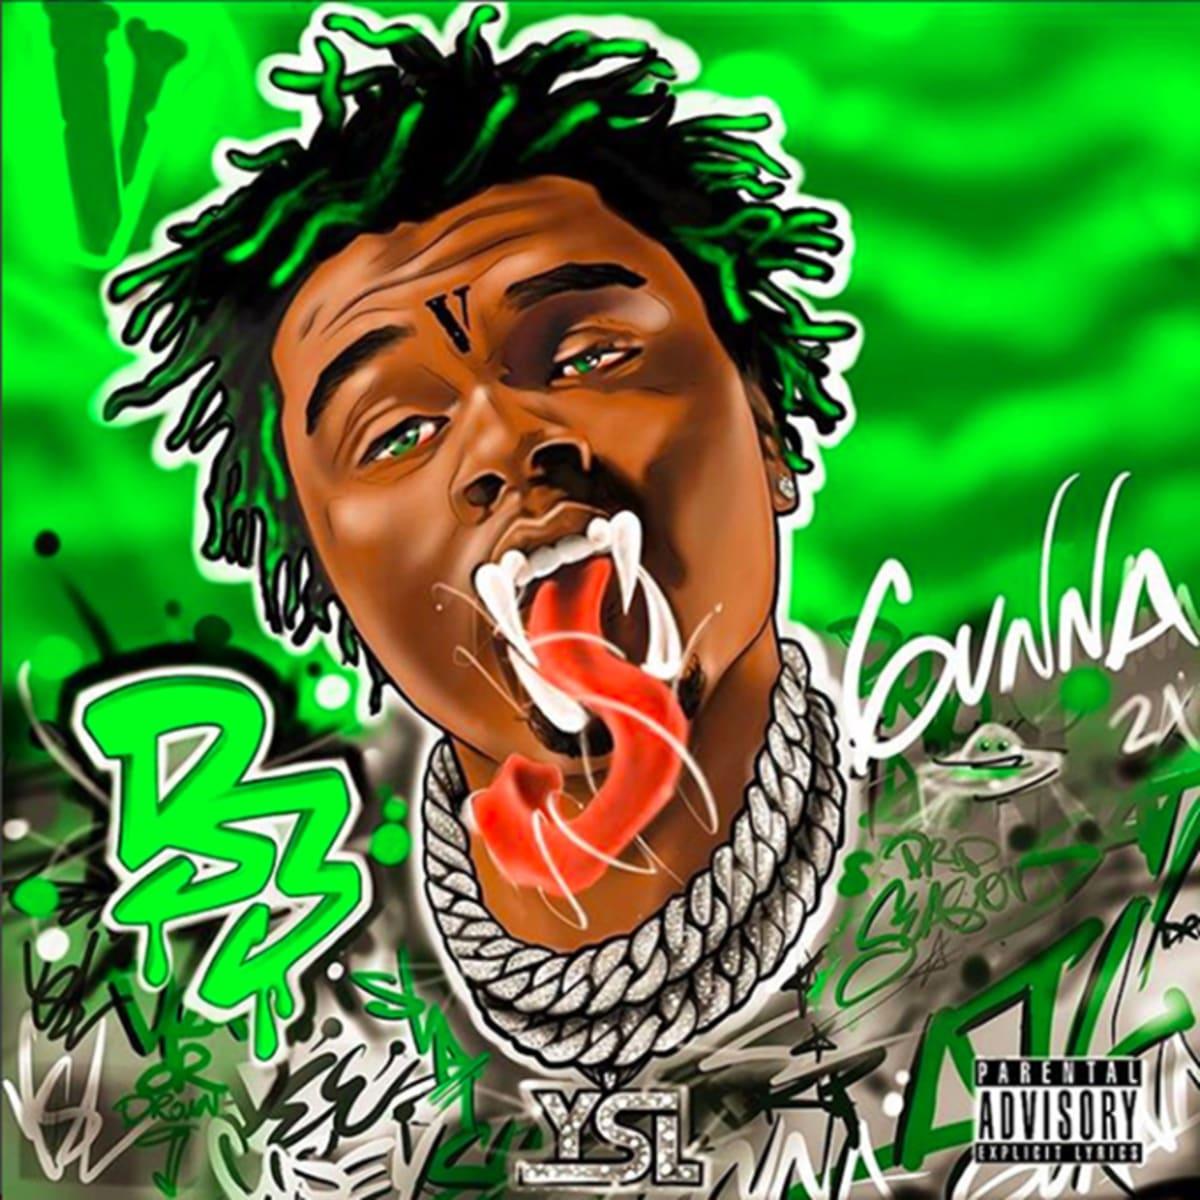 Gunna Drops 'Drip Season 3' Tape Featuring Young Thug, Lil